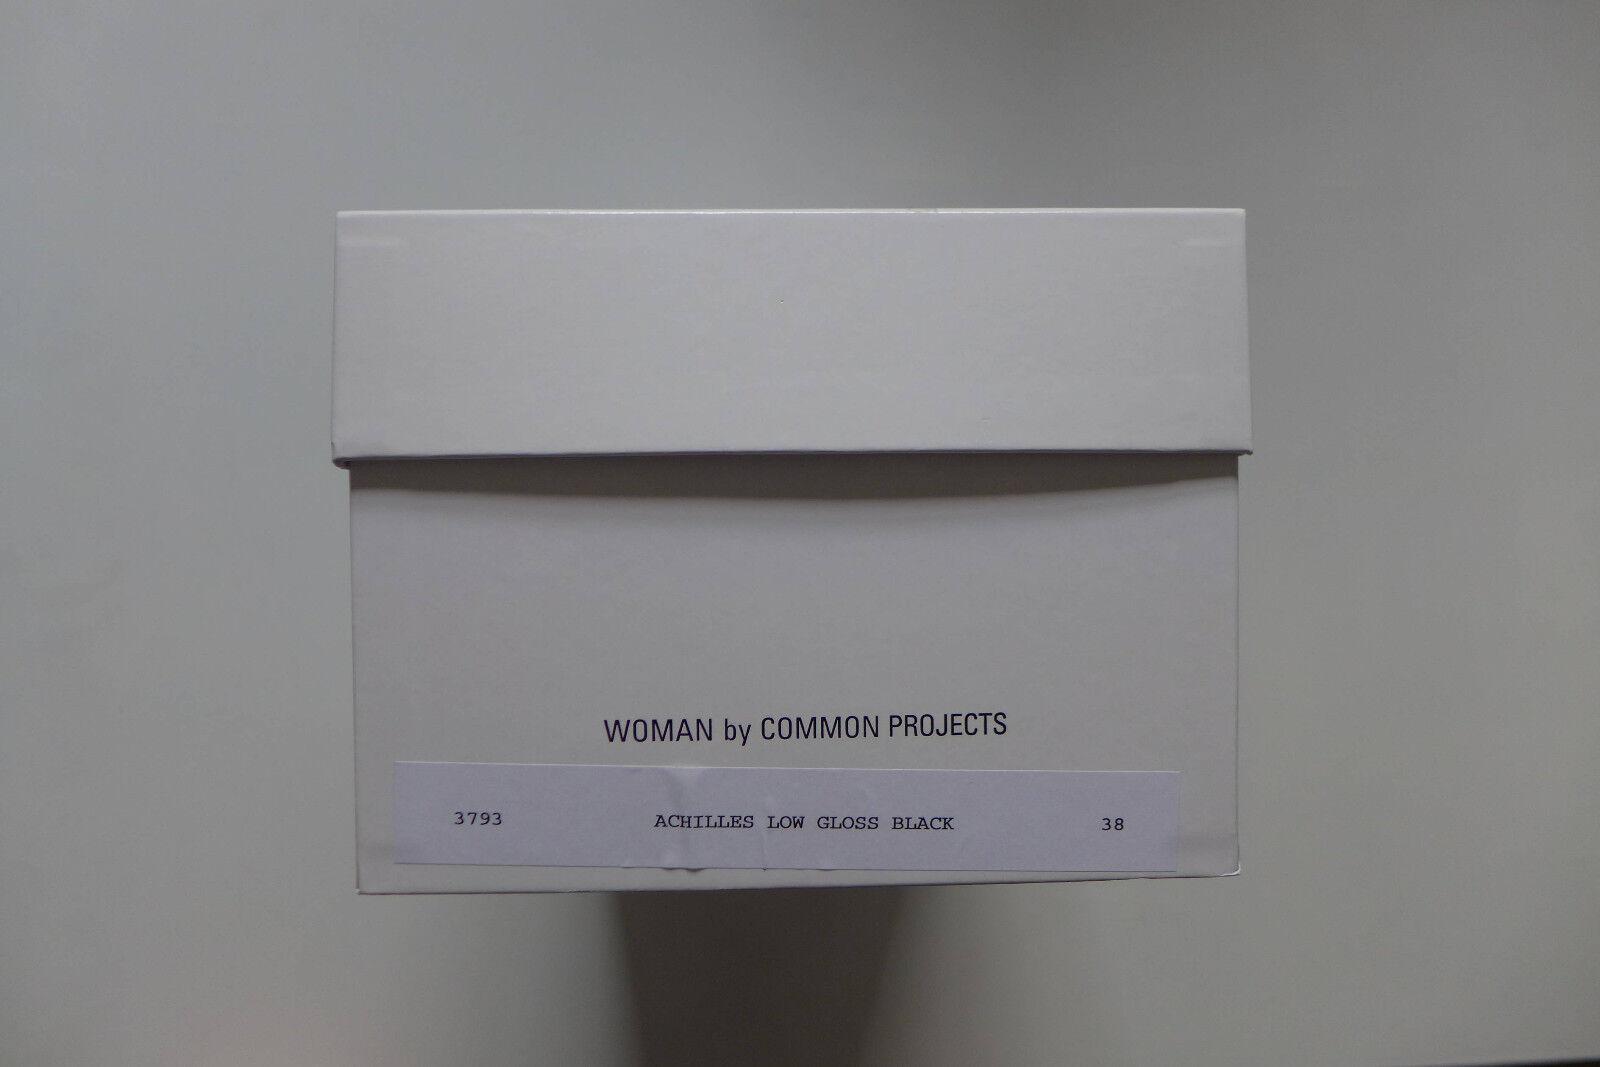 Mujer Mujer Mujer por proyectos comunes Aquiles Brillo Negro, Tallas 36 & 38-BNWB, bc80a1